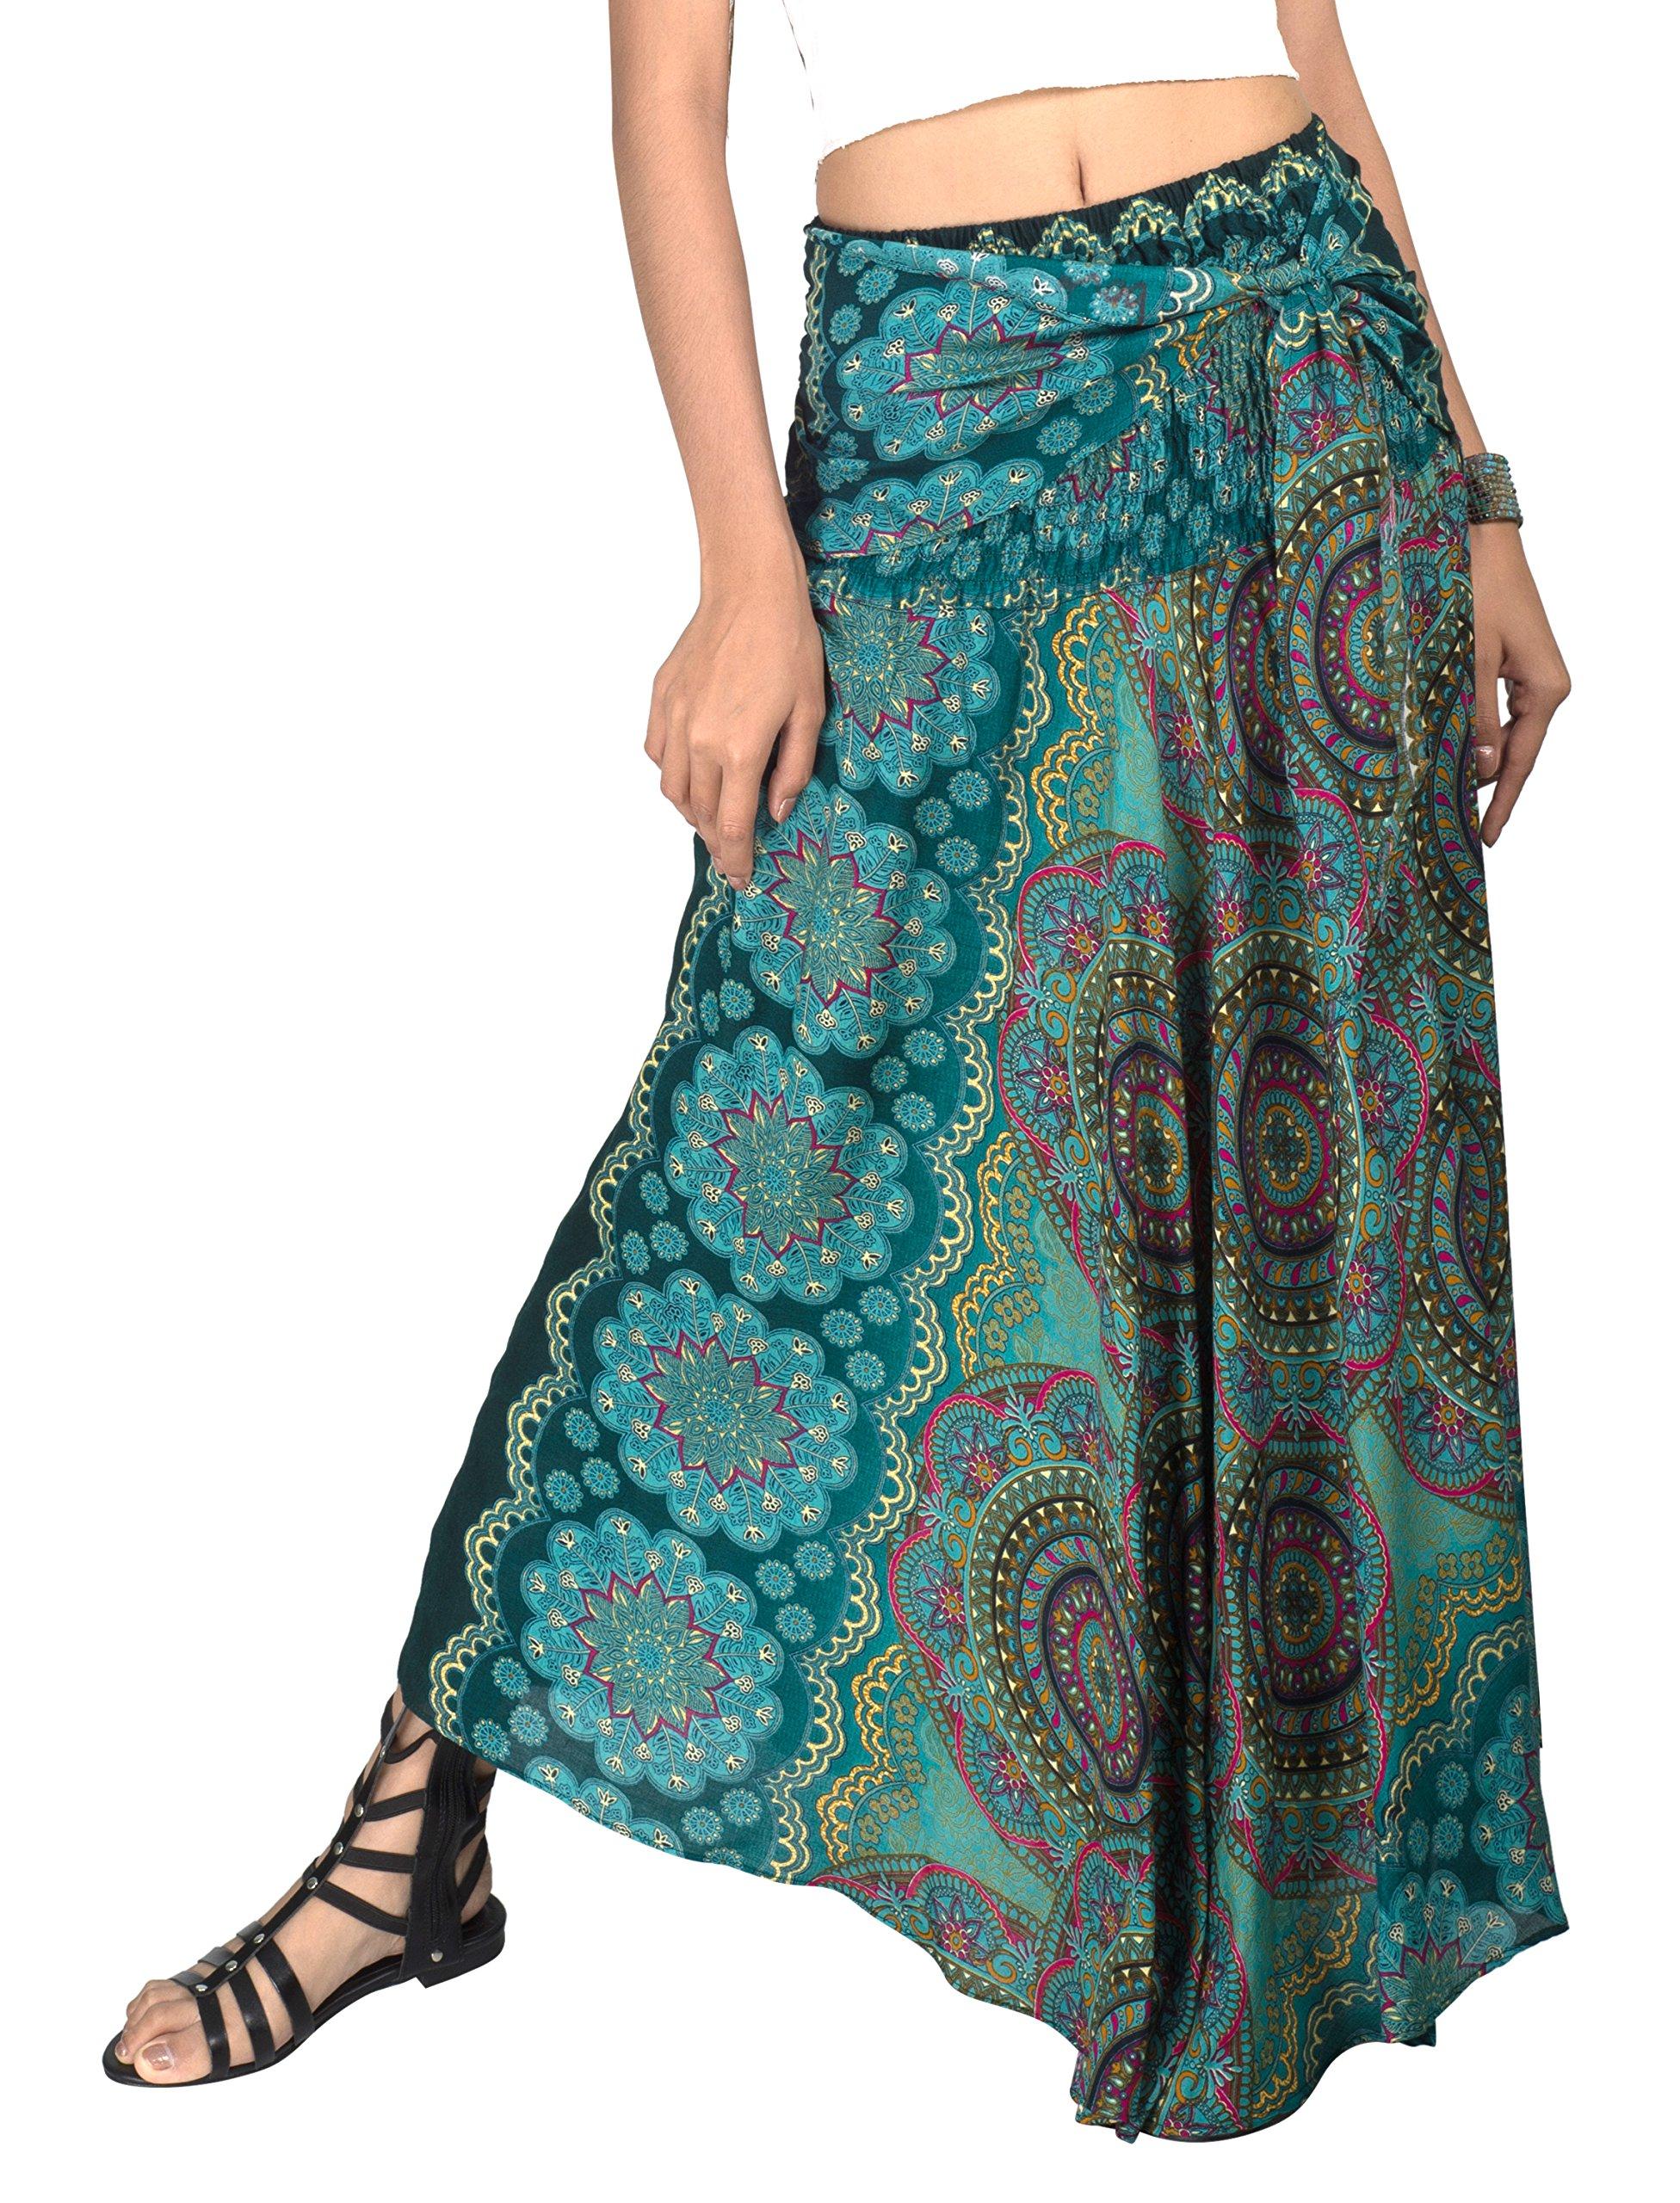 Joop Joop Versatile 2 in 1 Maxi Dress Bohemian Loose Flowing Summer Travel Beach Festival Lounge Dress and Skirt